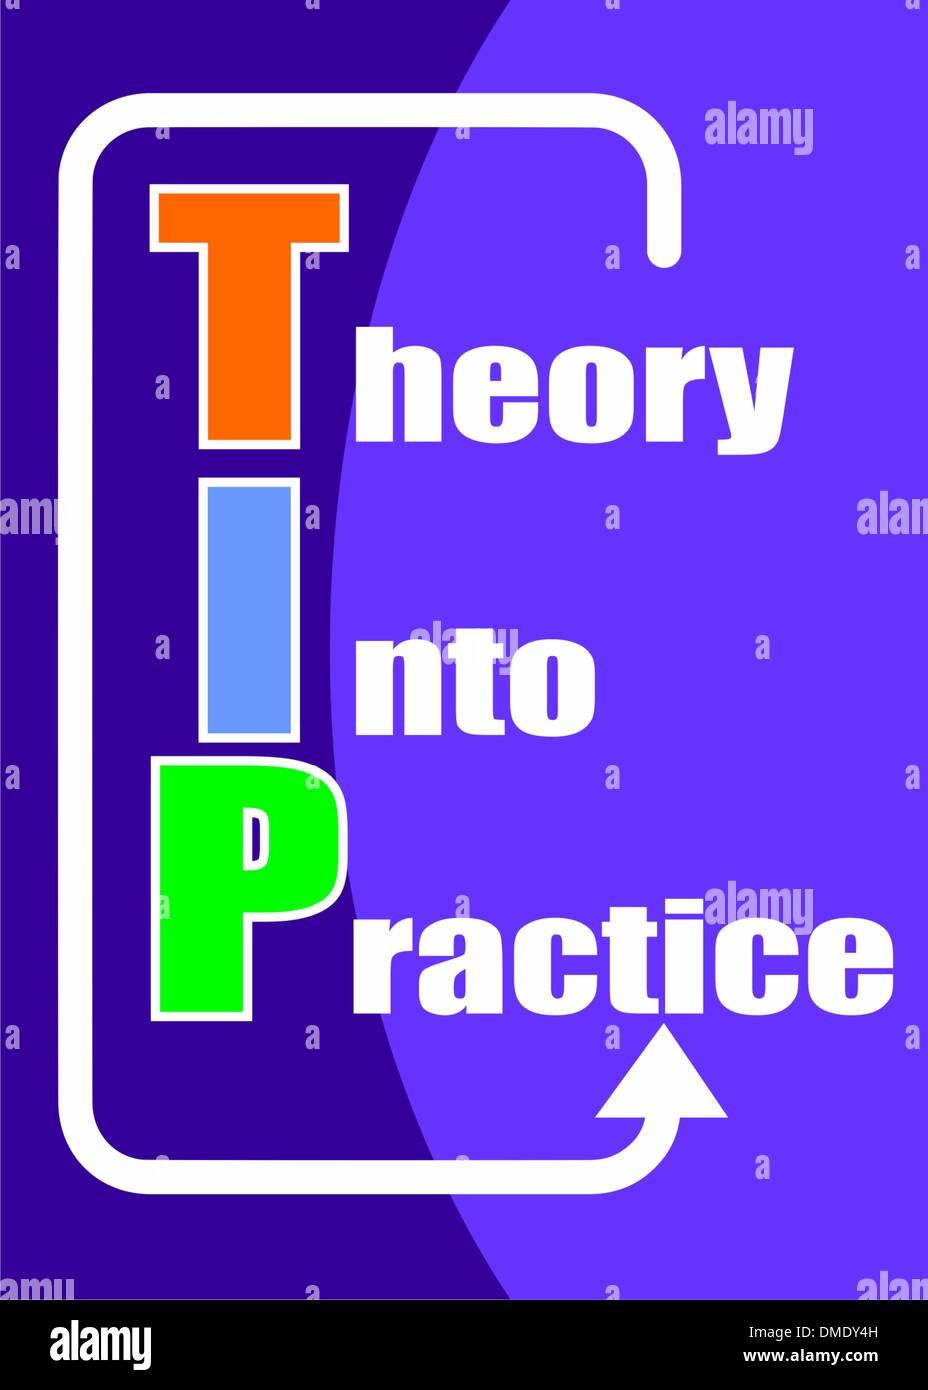 Theory into practice - TIP acronym - Stock Image